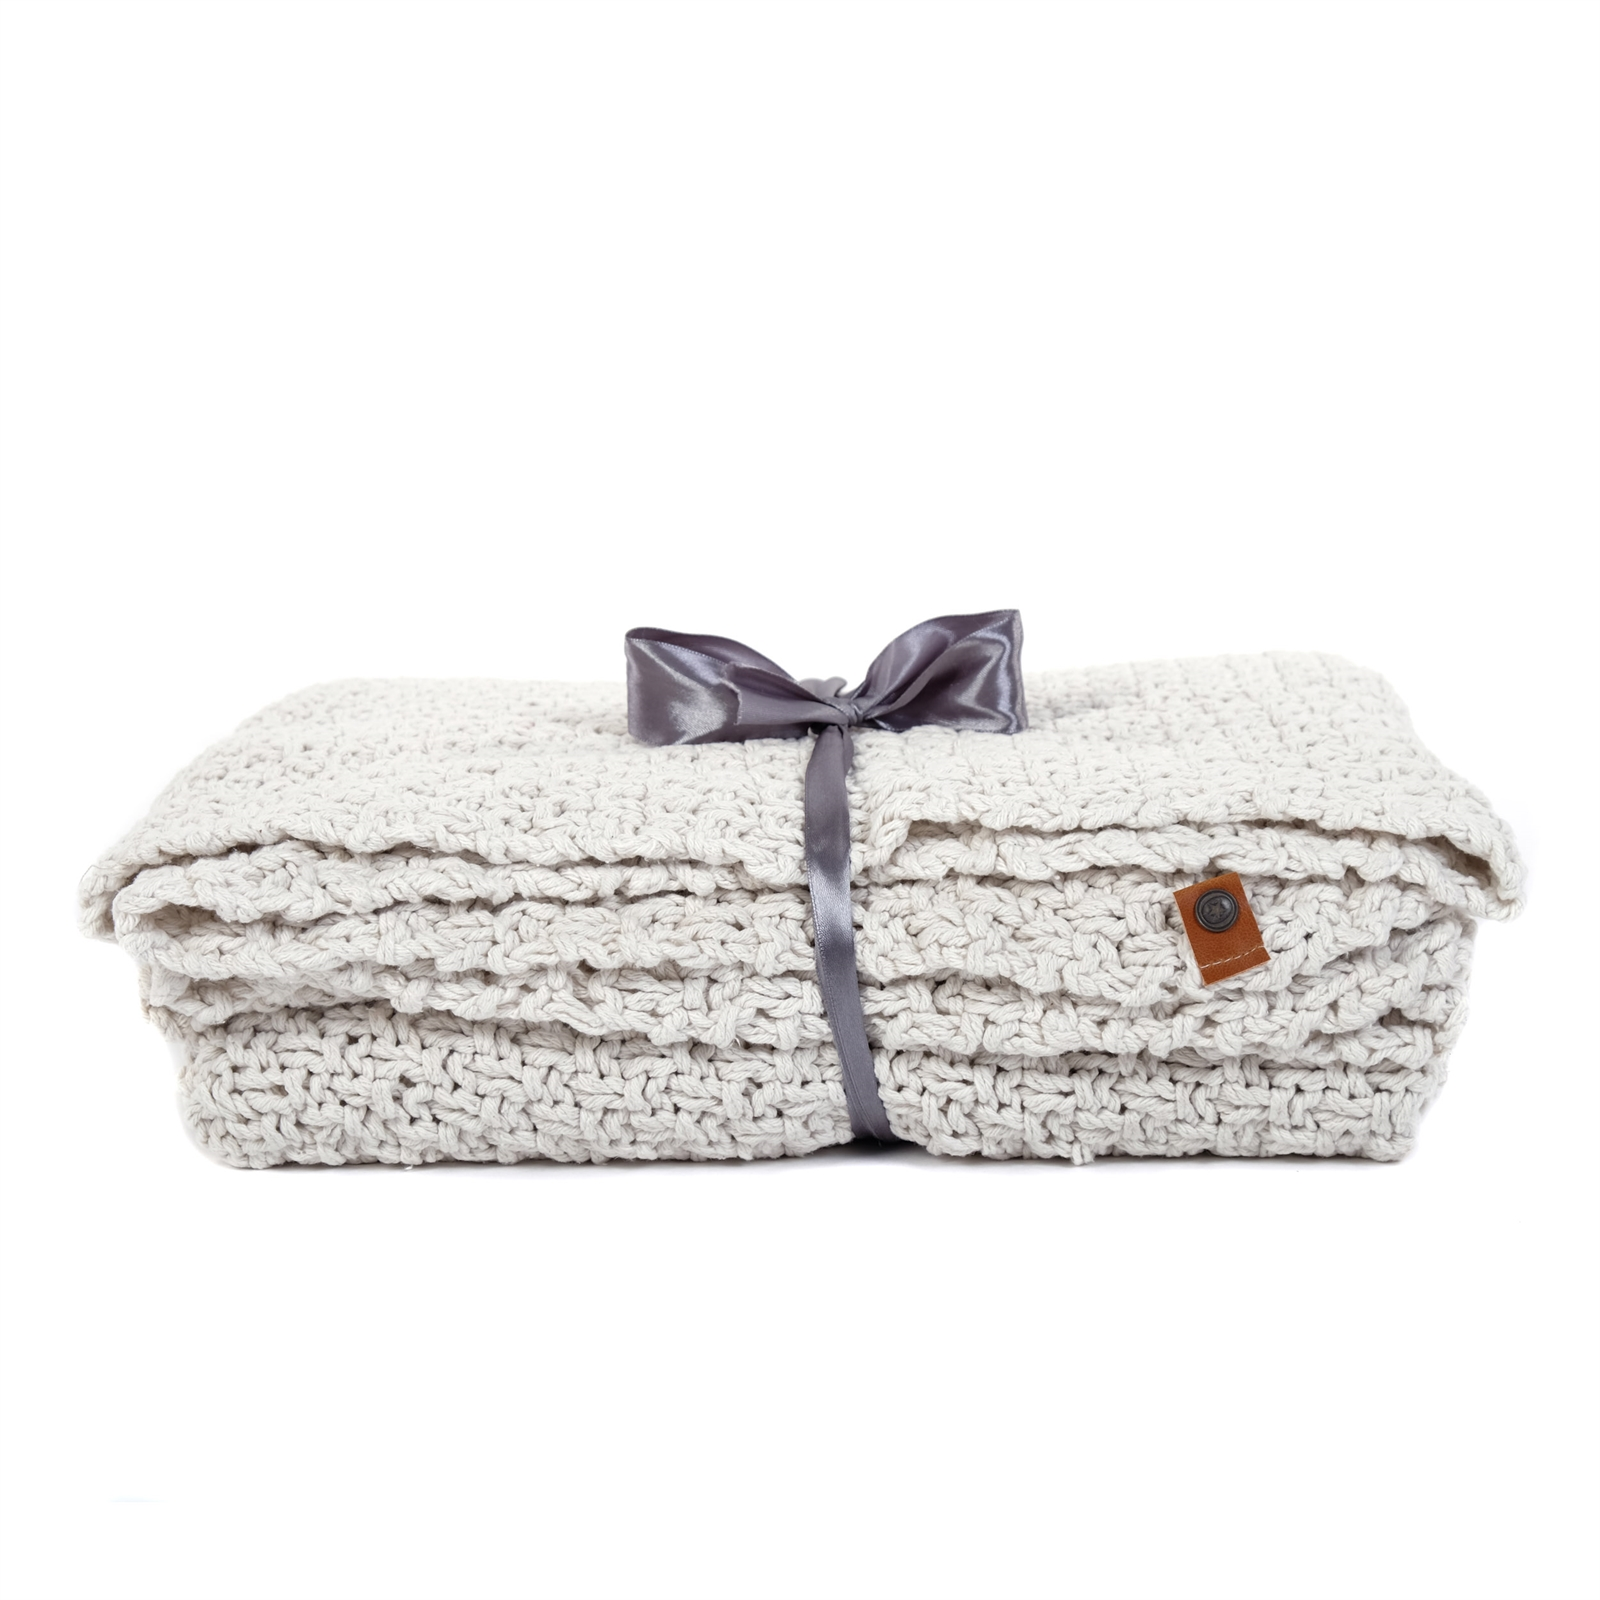 strick plaid svea 130x150 cm cremefarben baumwolle decke wolldecke ebay. Black Bedroom Furniture Sets. Home Design Ideas